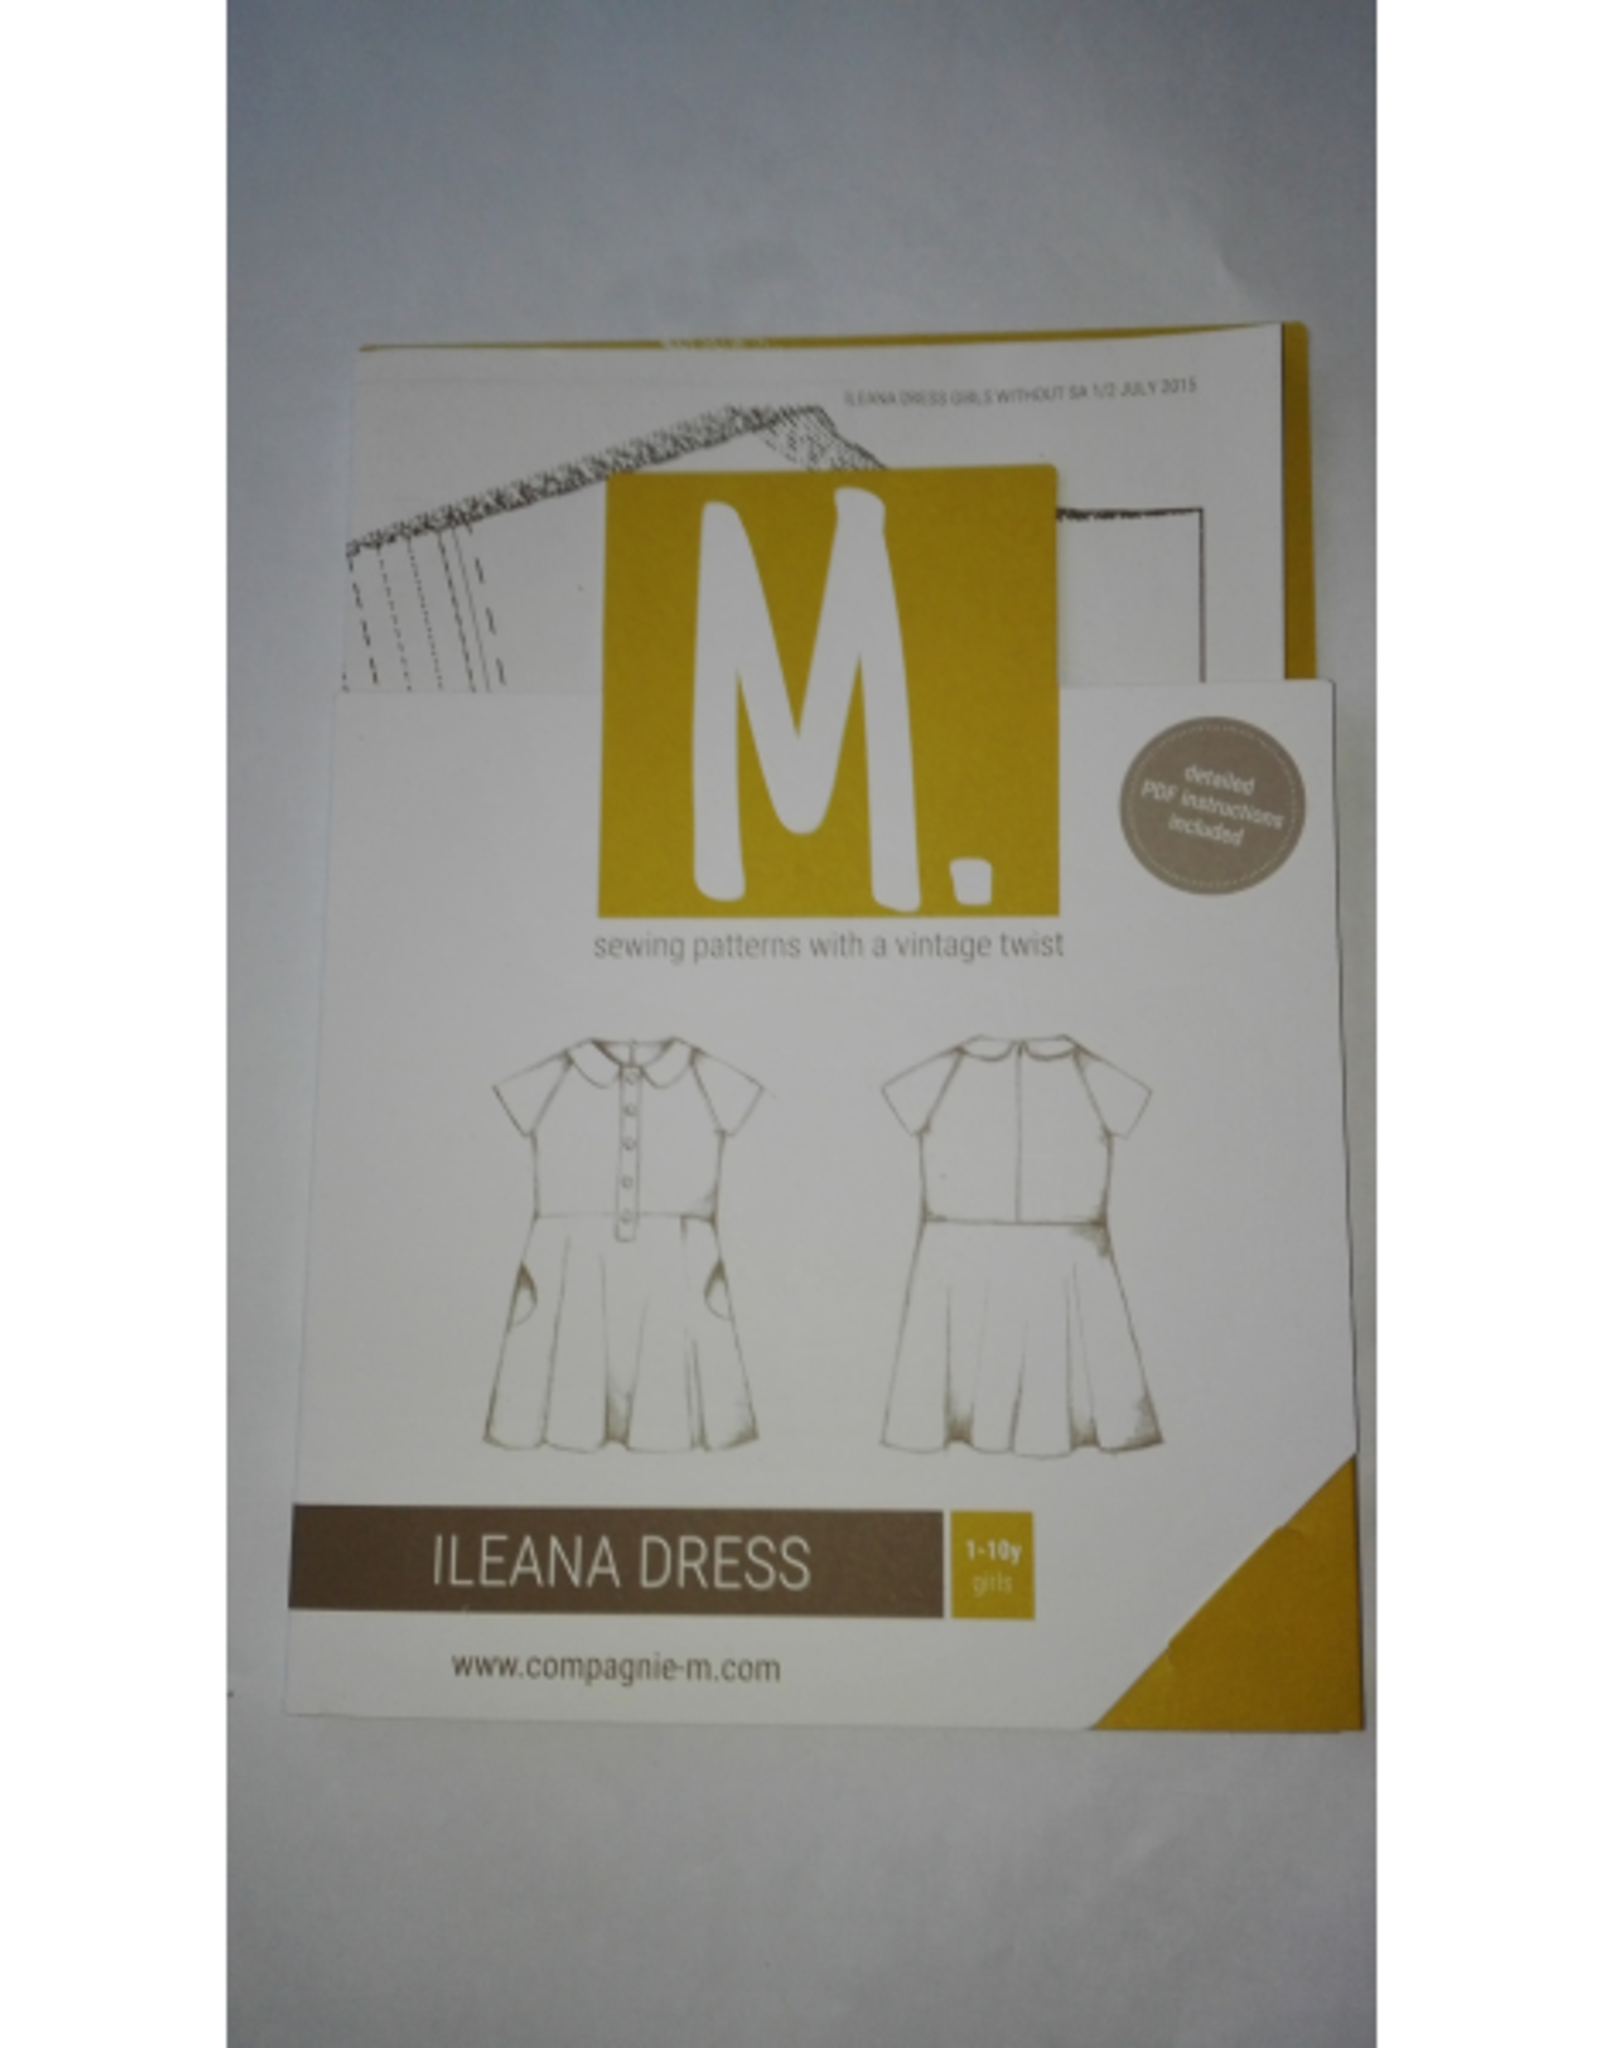 Compagnie M Compagnie M Ileana dress